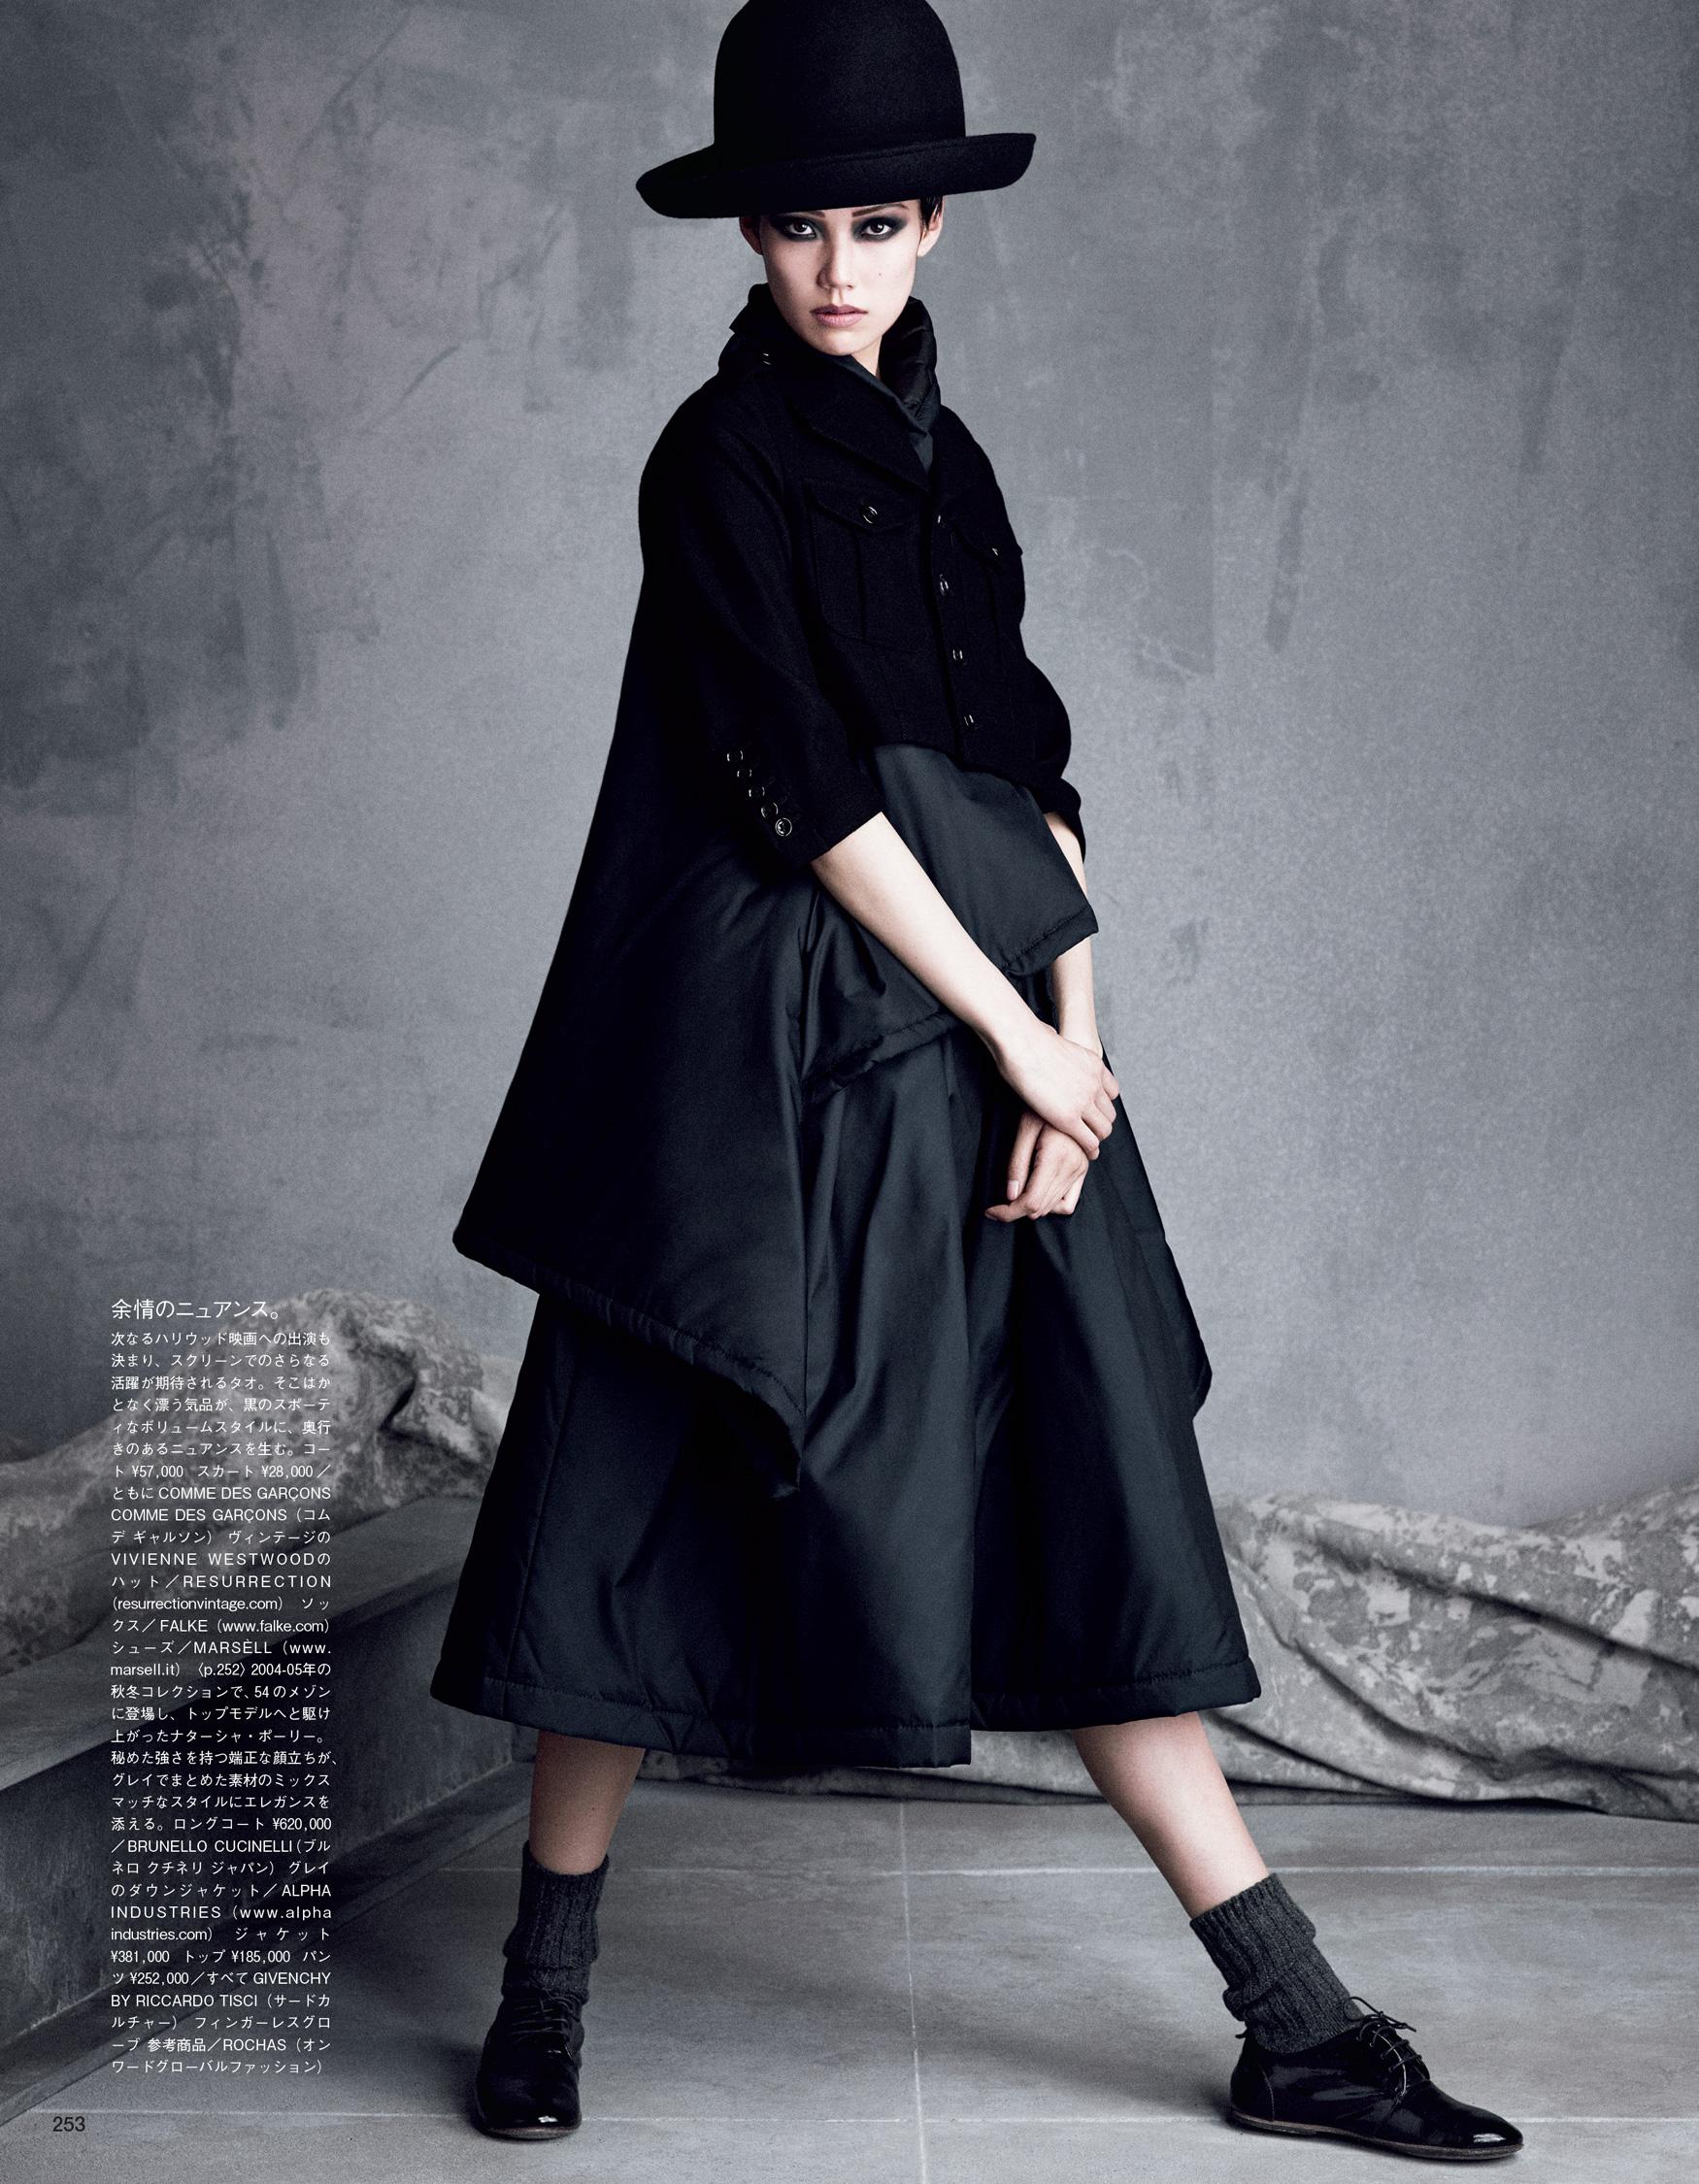 Giovanna-Battaglia-The-Icons-Of-Perfections-Vogue-Japan-15th-Anniversary-Issue-Luigi-Iango-V181_253_200-15.jpg